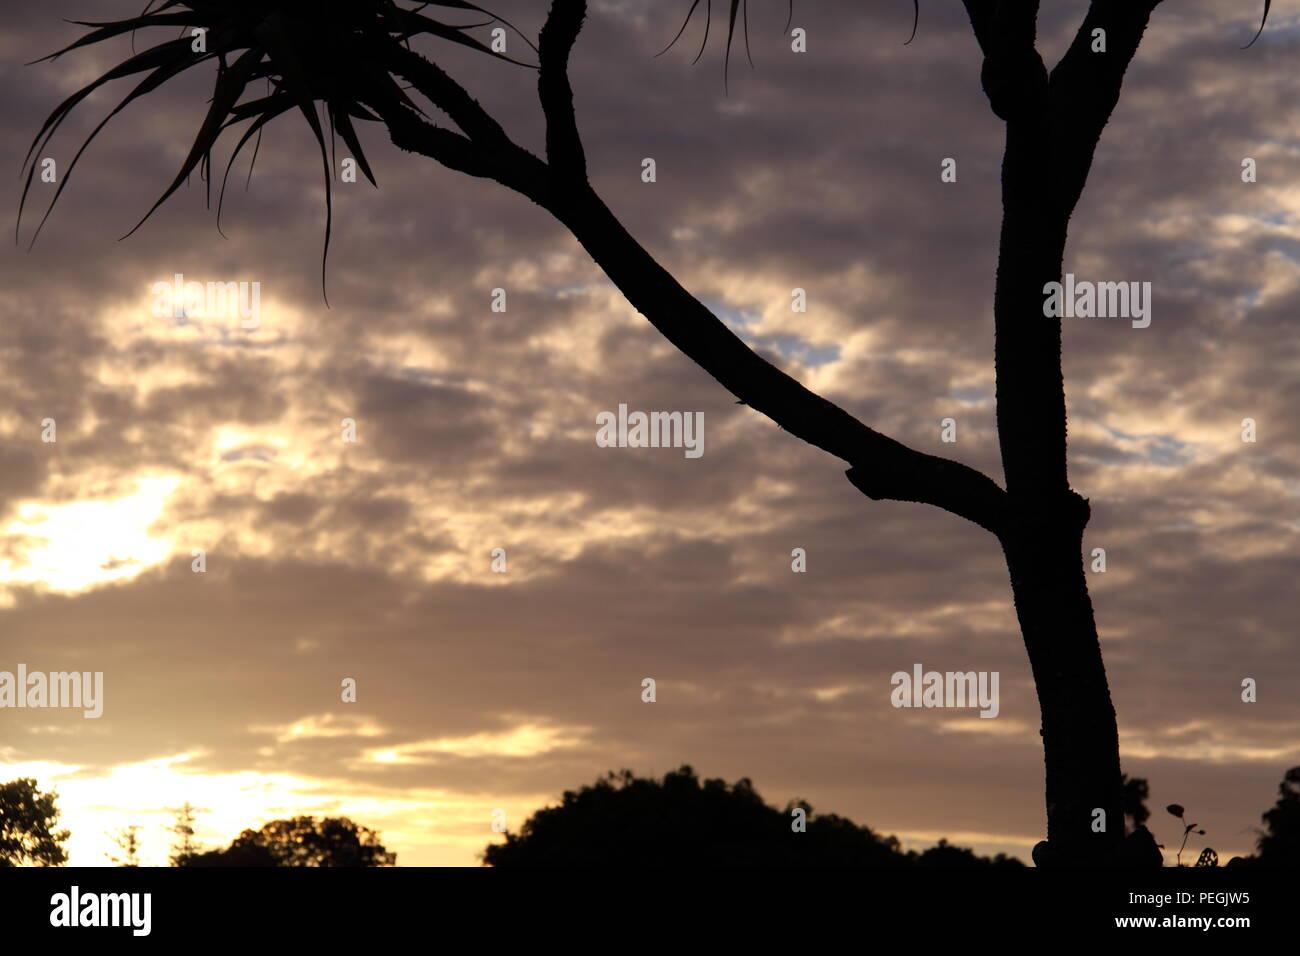 Pandanus Screw Palm (Pandanus Tectorius Australianus) at Sunset, Gold Coast - Stock Image